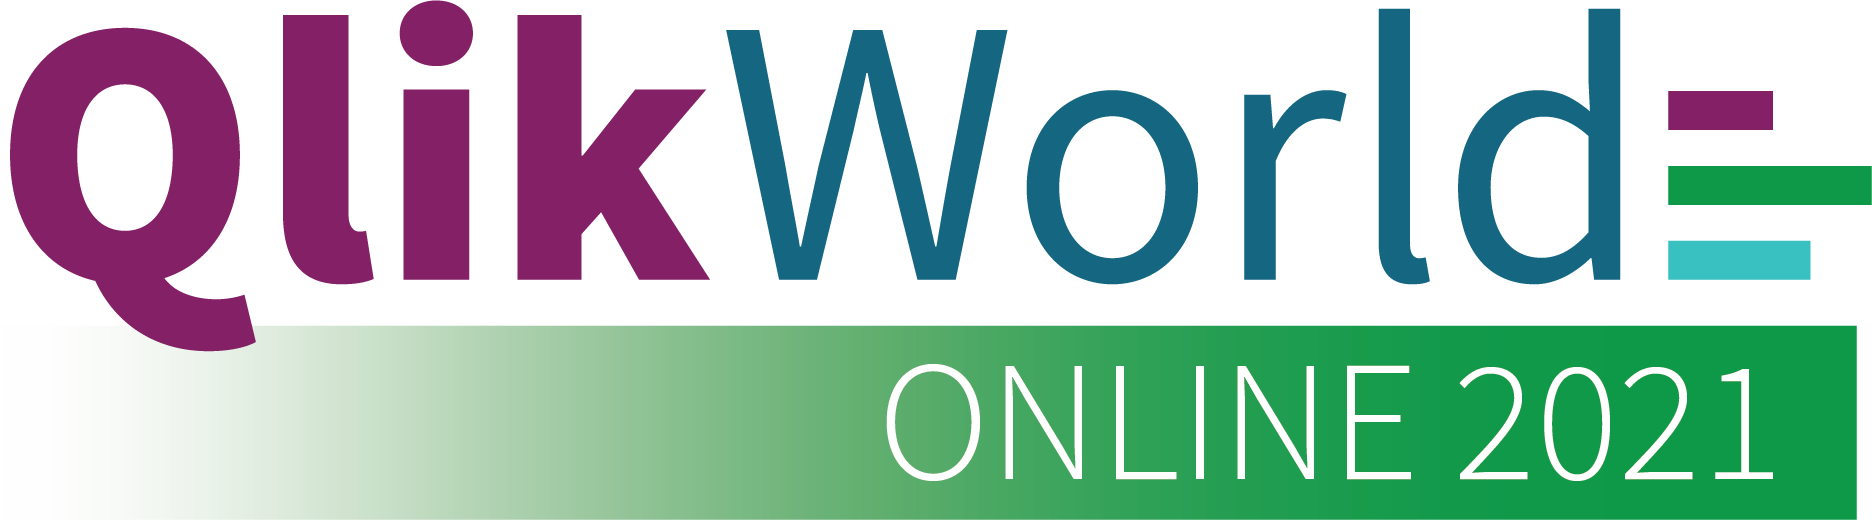 qlikworldonline_logo-full-color_rgb-copy